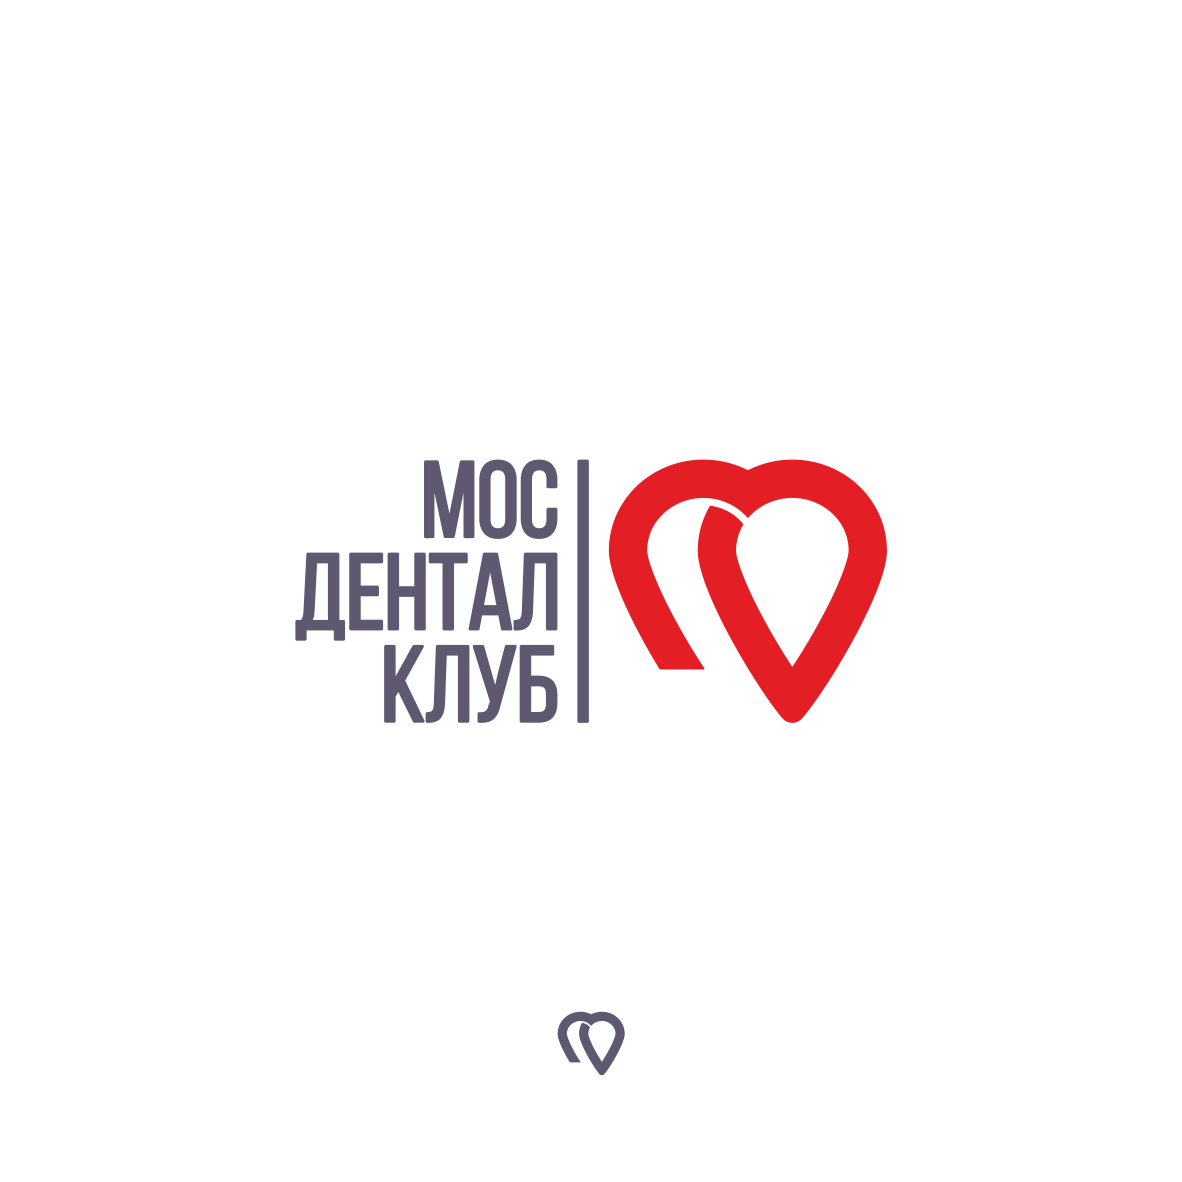 Разработка логотипа стоматологического медицинского центра фото f_0365e4a9590a1923.png